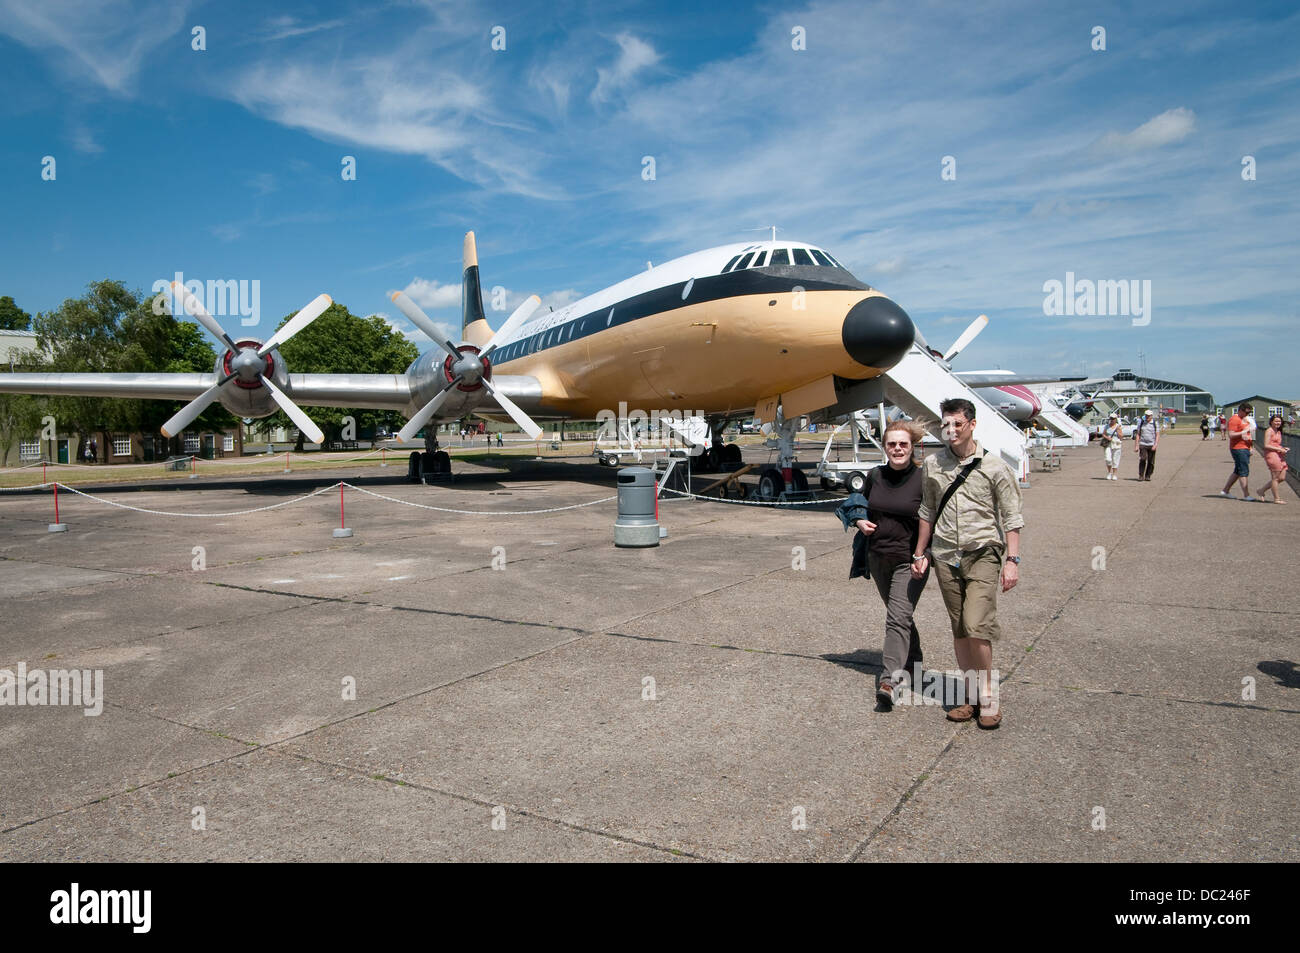 Visitors at Duxford Imperial War Museum. Couple walking along civil aircraft exposition. Bristol Britannia 312 aircraft. - Stock Image